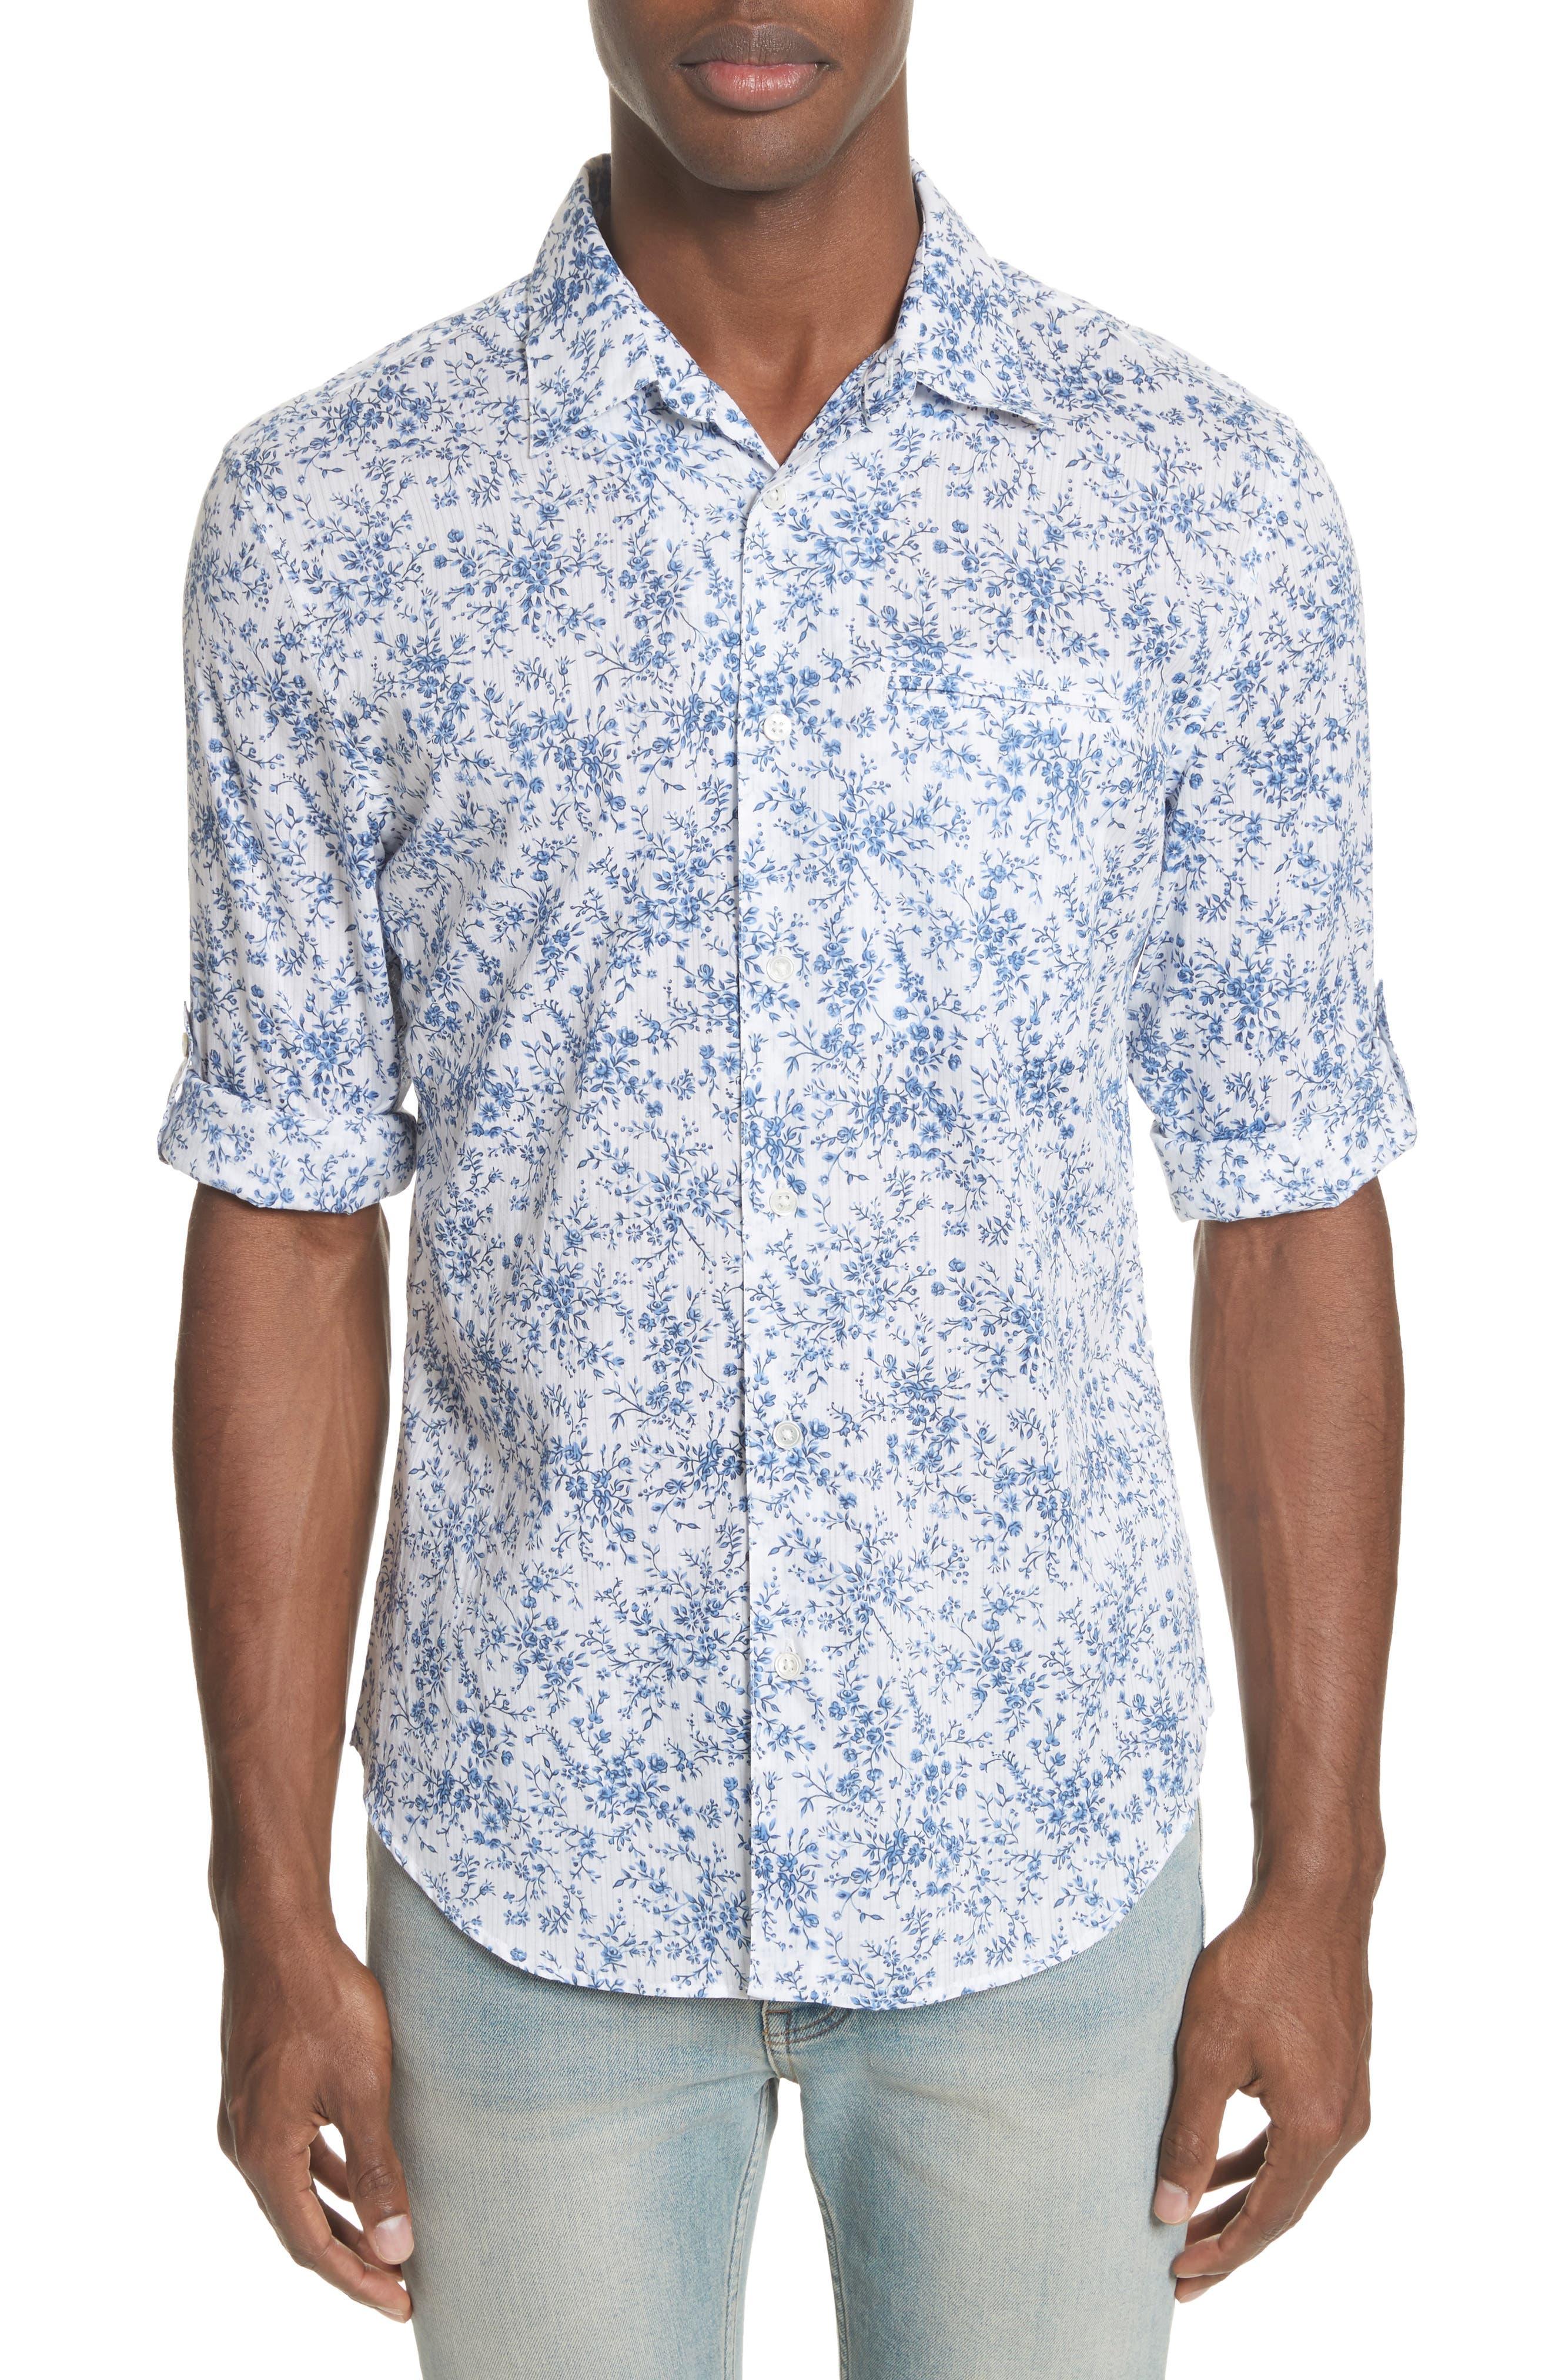 John Varvatos Slim Fit Floral Print Shirt